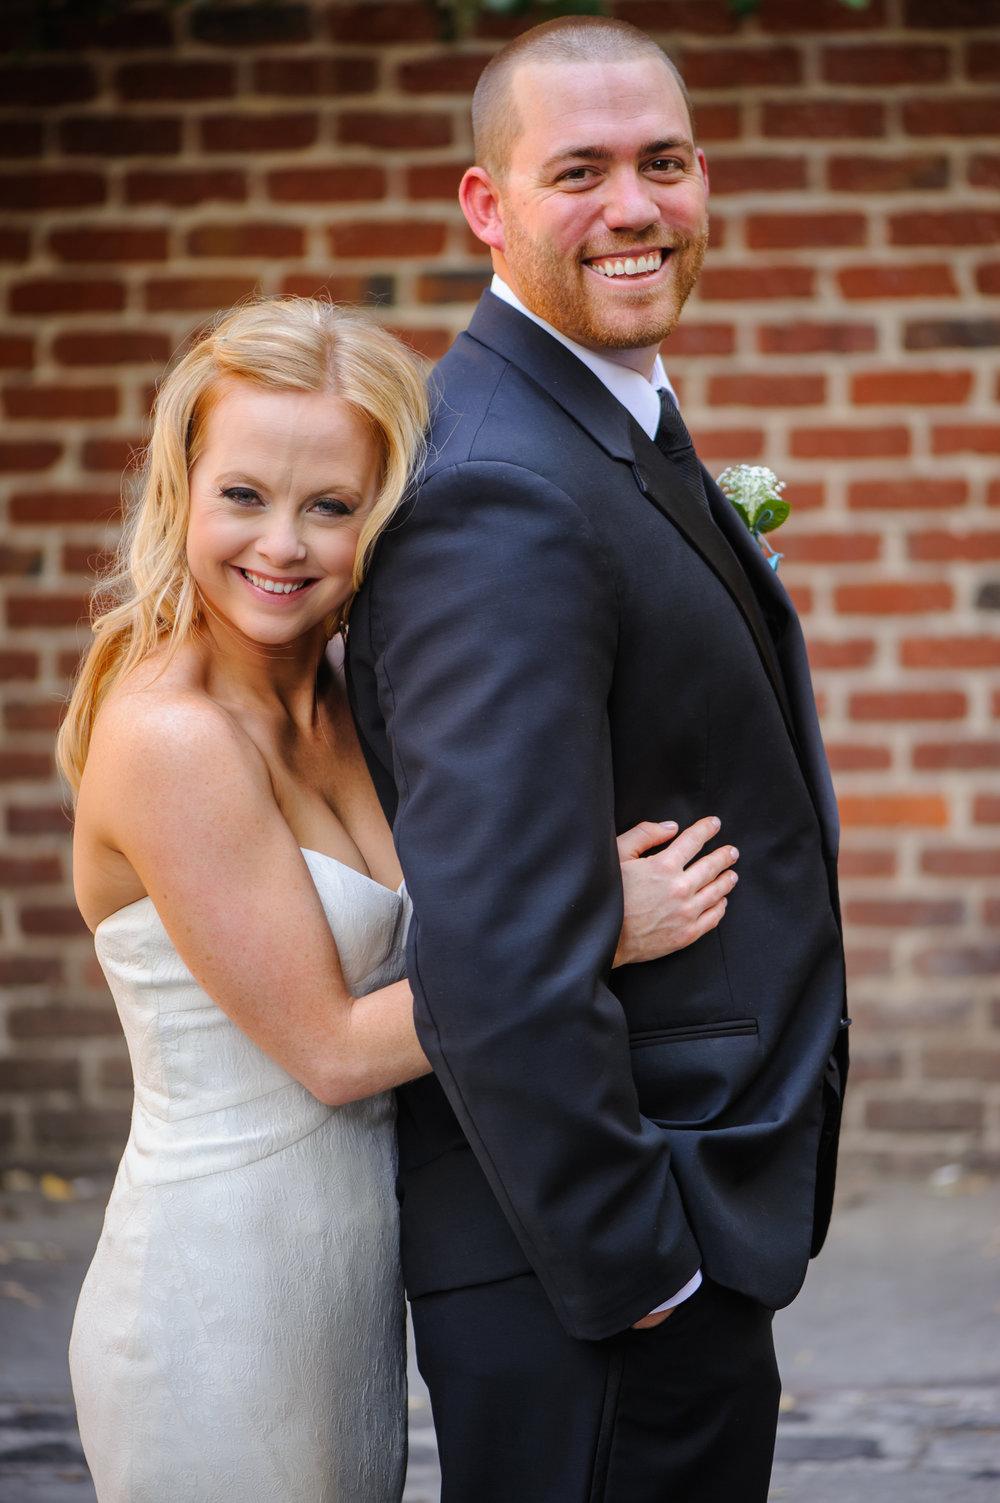 jenelle-brian-001-courtyard-d'oro-old-sacramento-wedding-photographer-katherine-nicole-photography030.JPG